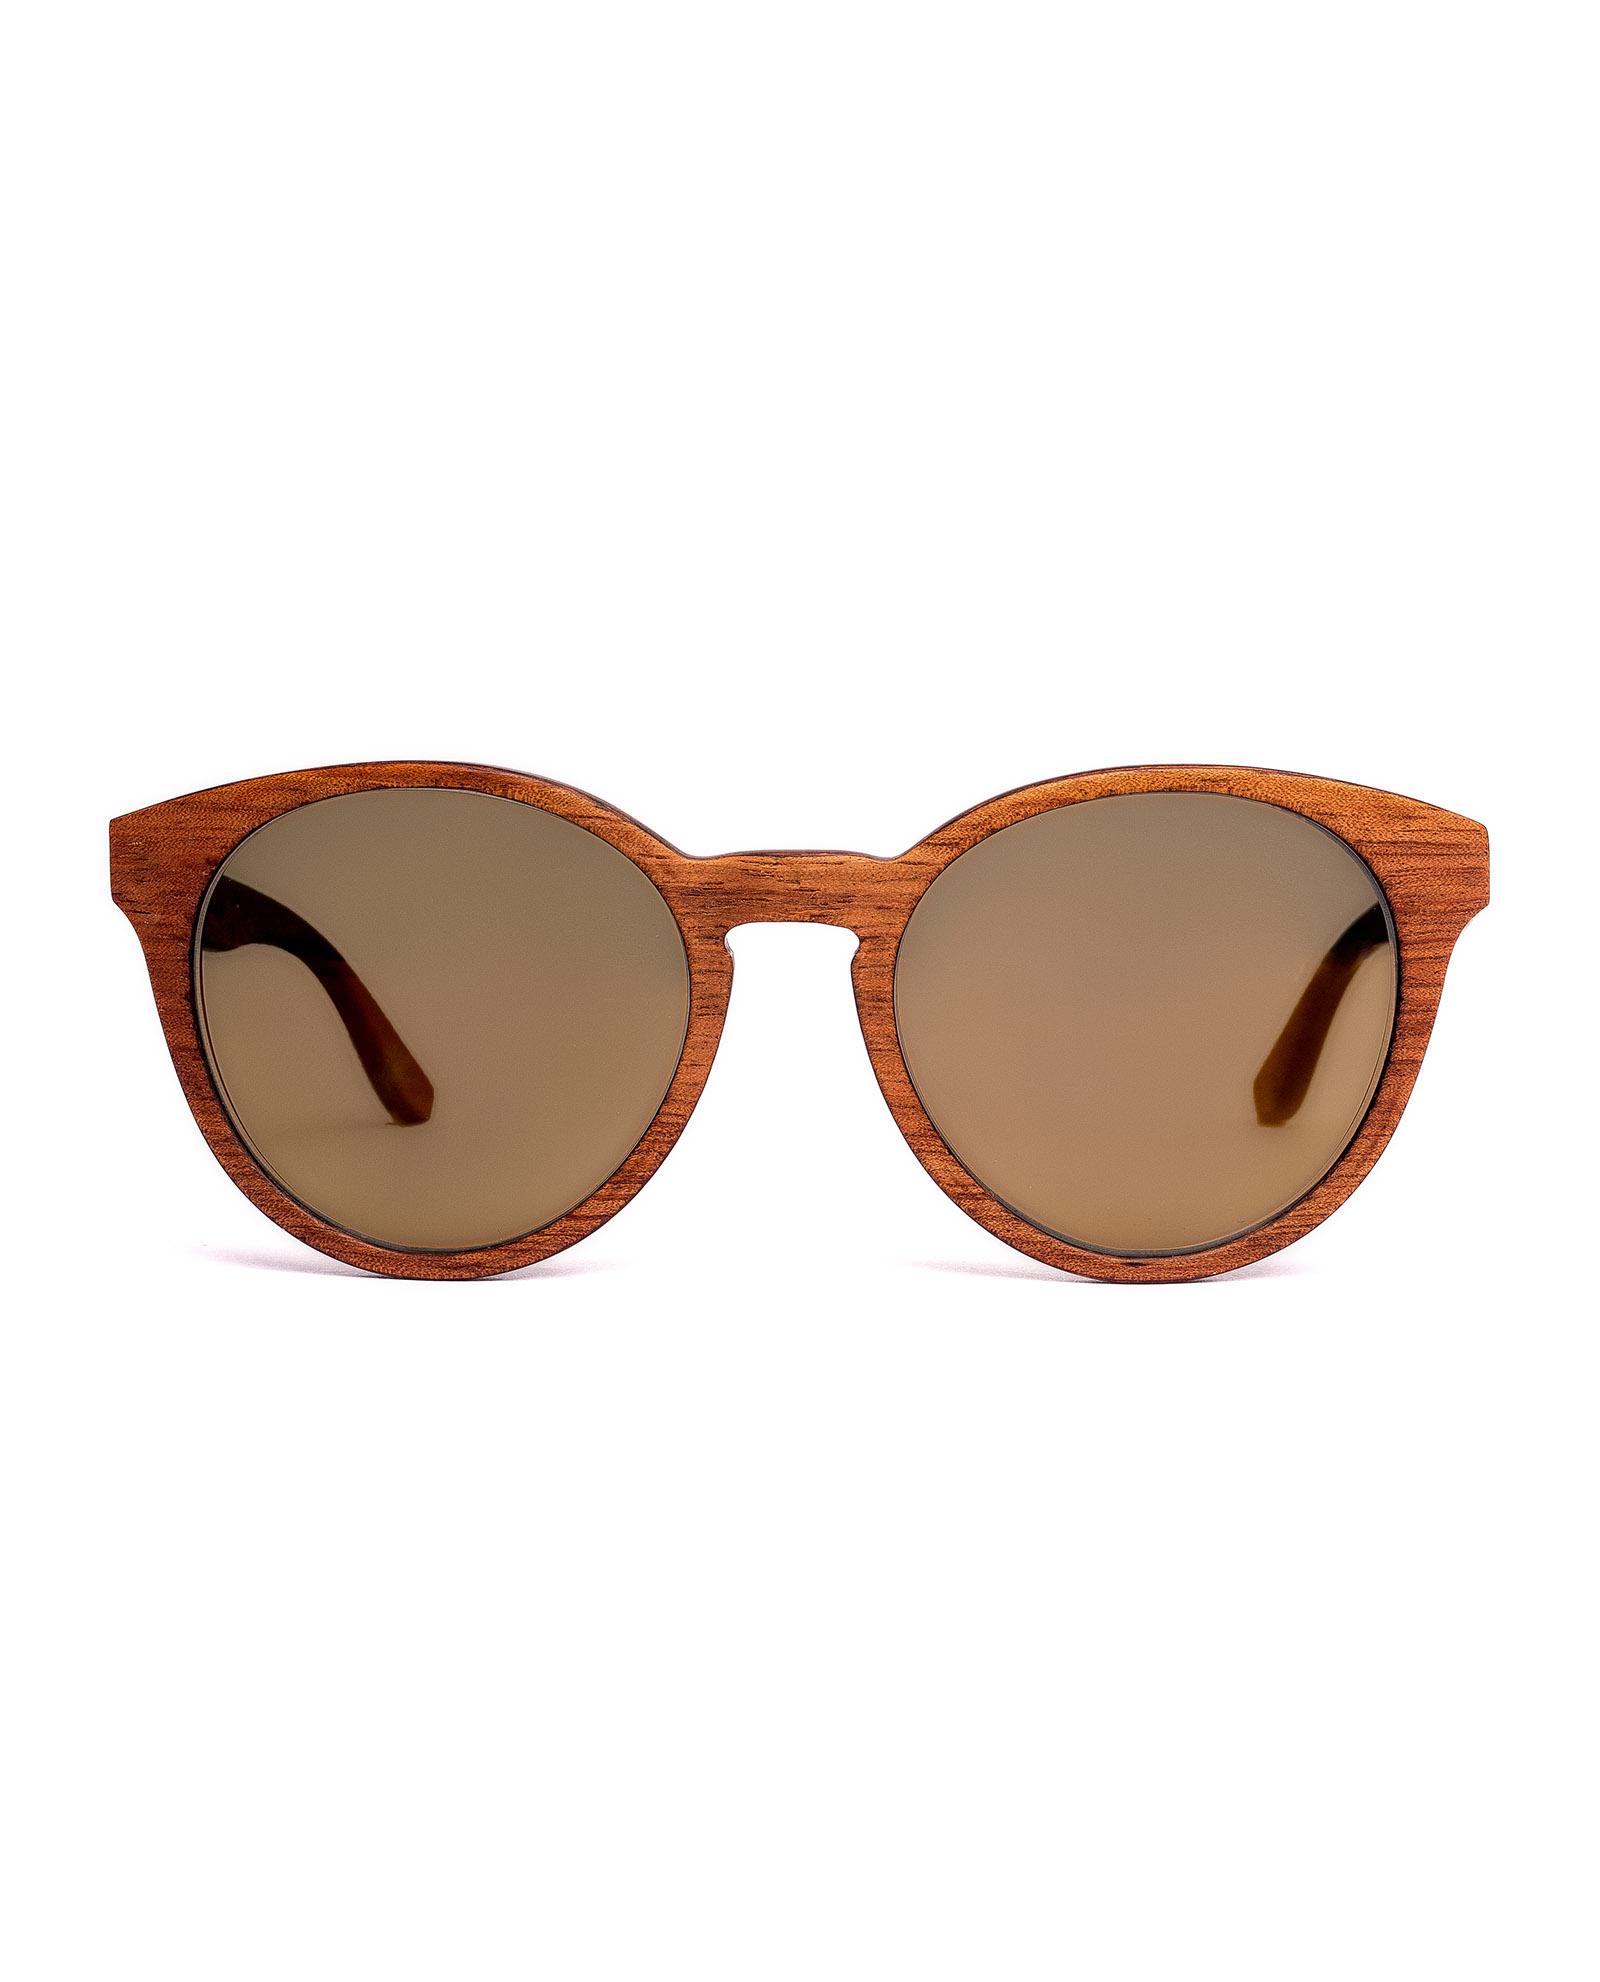 eb54ef2f52 Fabulous Florence – Wooden Sunglasses